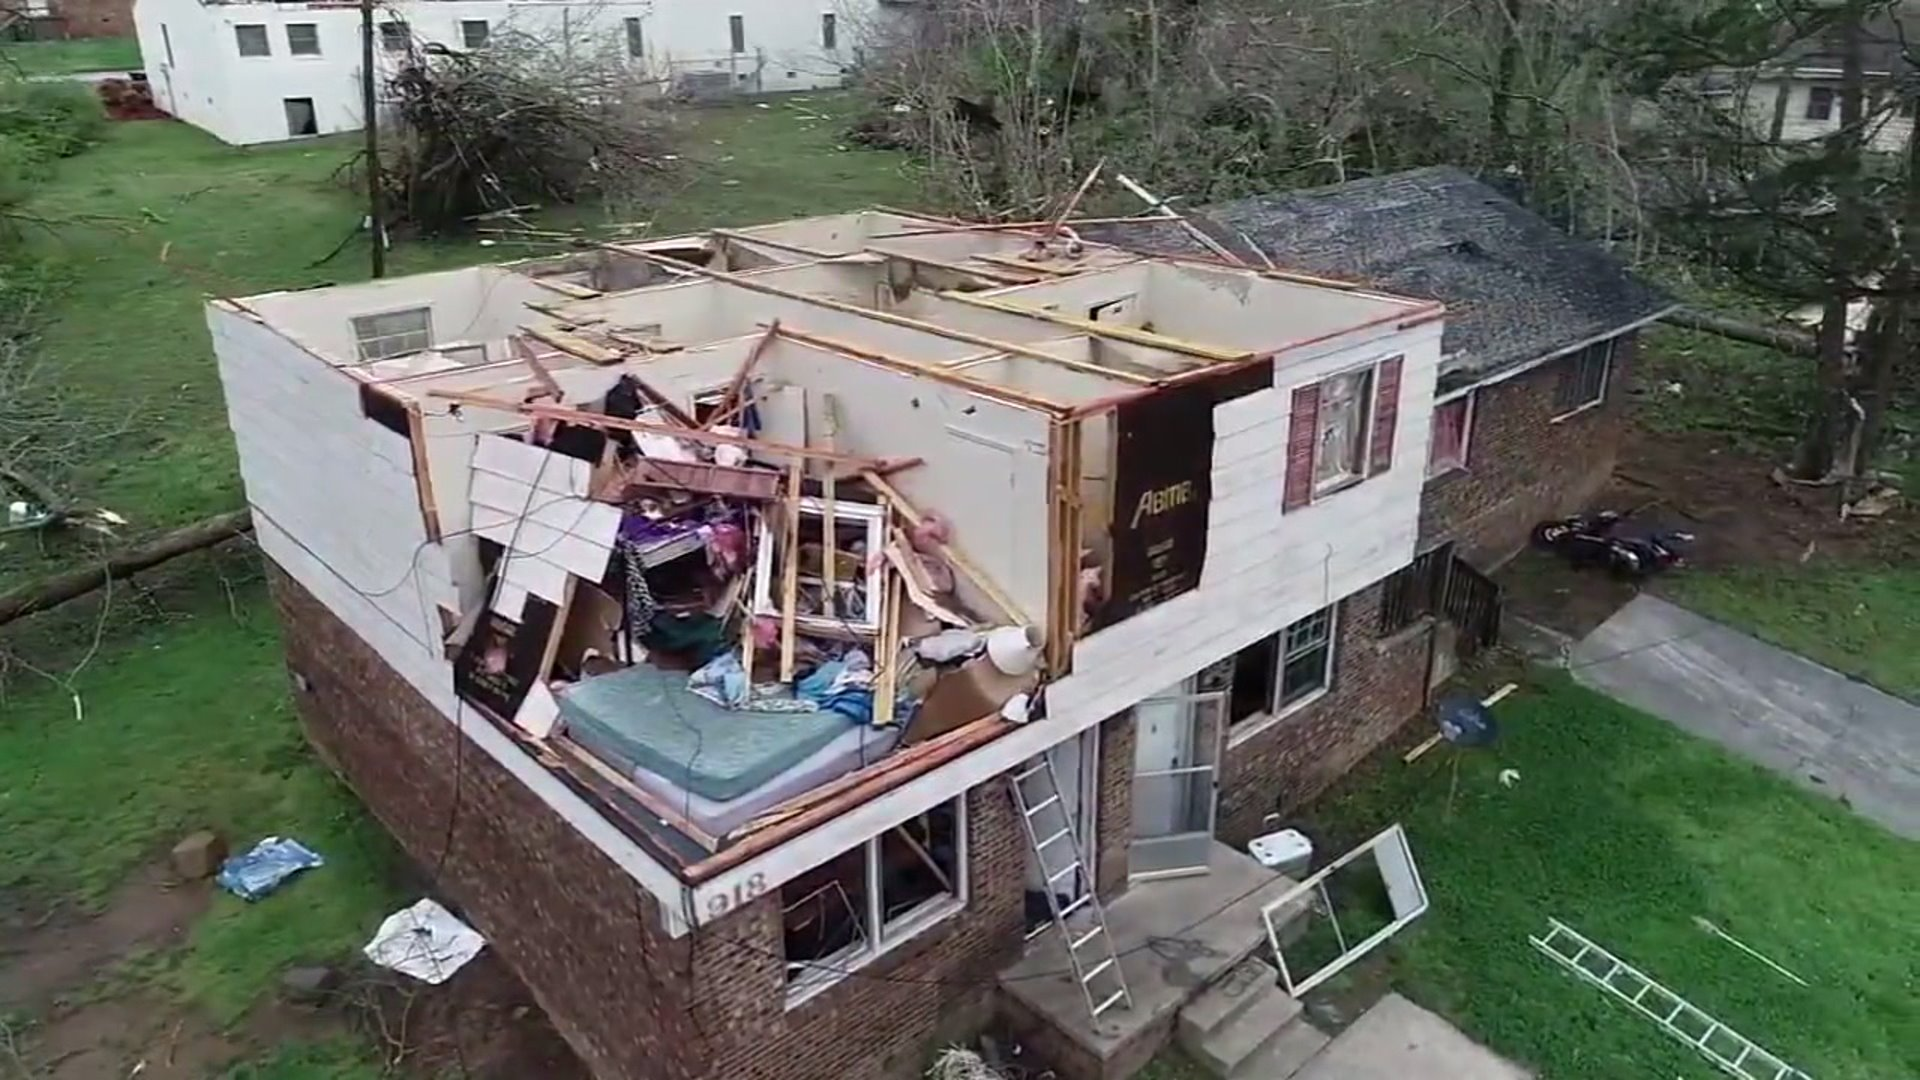 Habitat for Humanity continues rebuilding east Greensboro years after devastating tornado